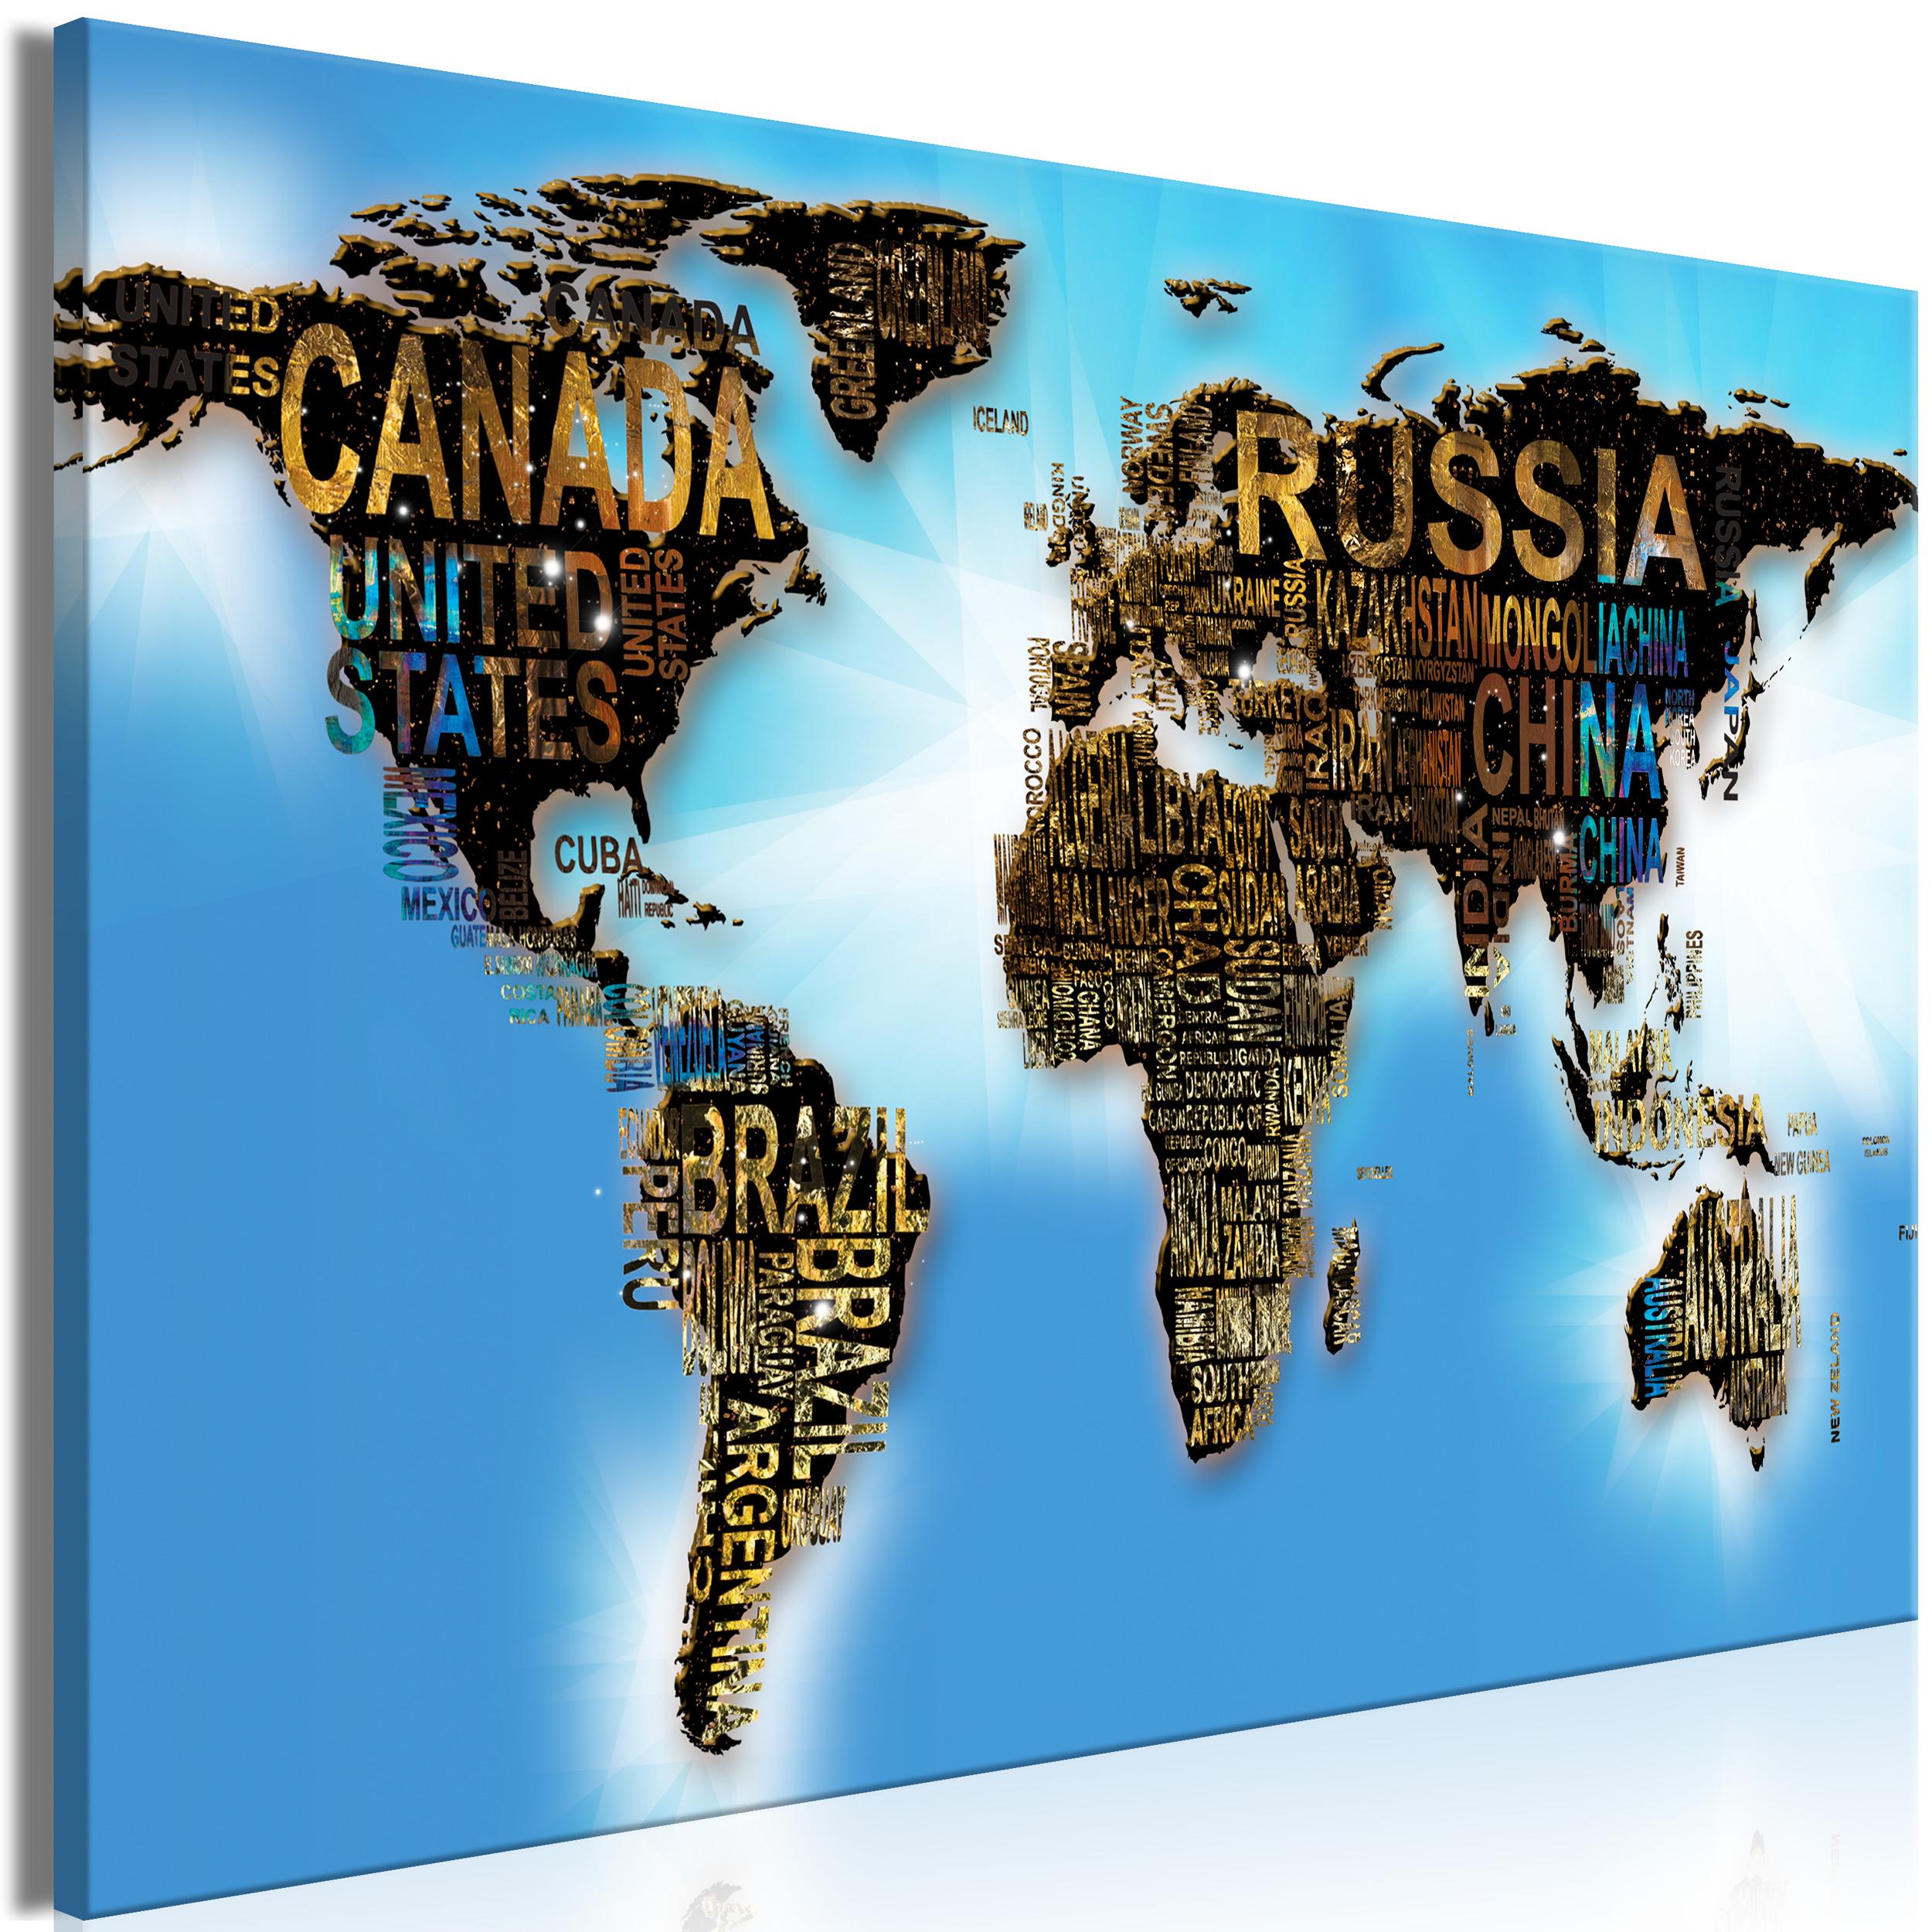 Weltkarte pinnwand kork leinwandbilder bilder wandbilder for Wohnzimmer leinwandbilder